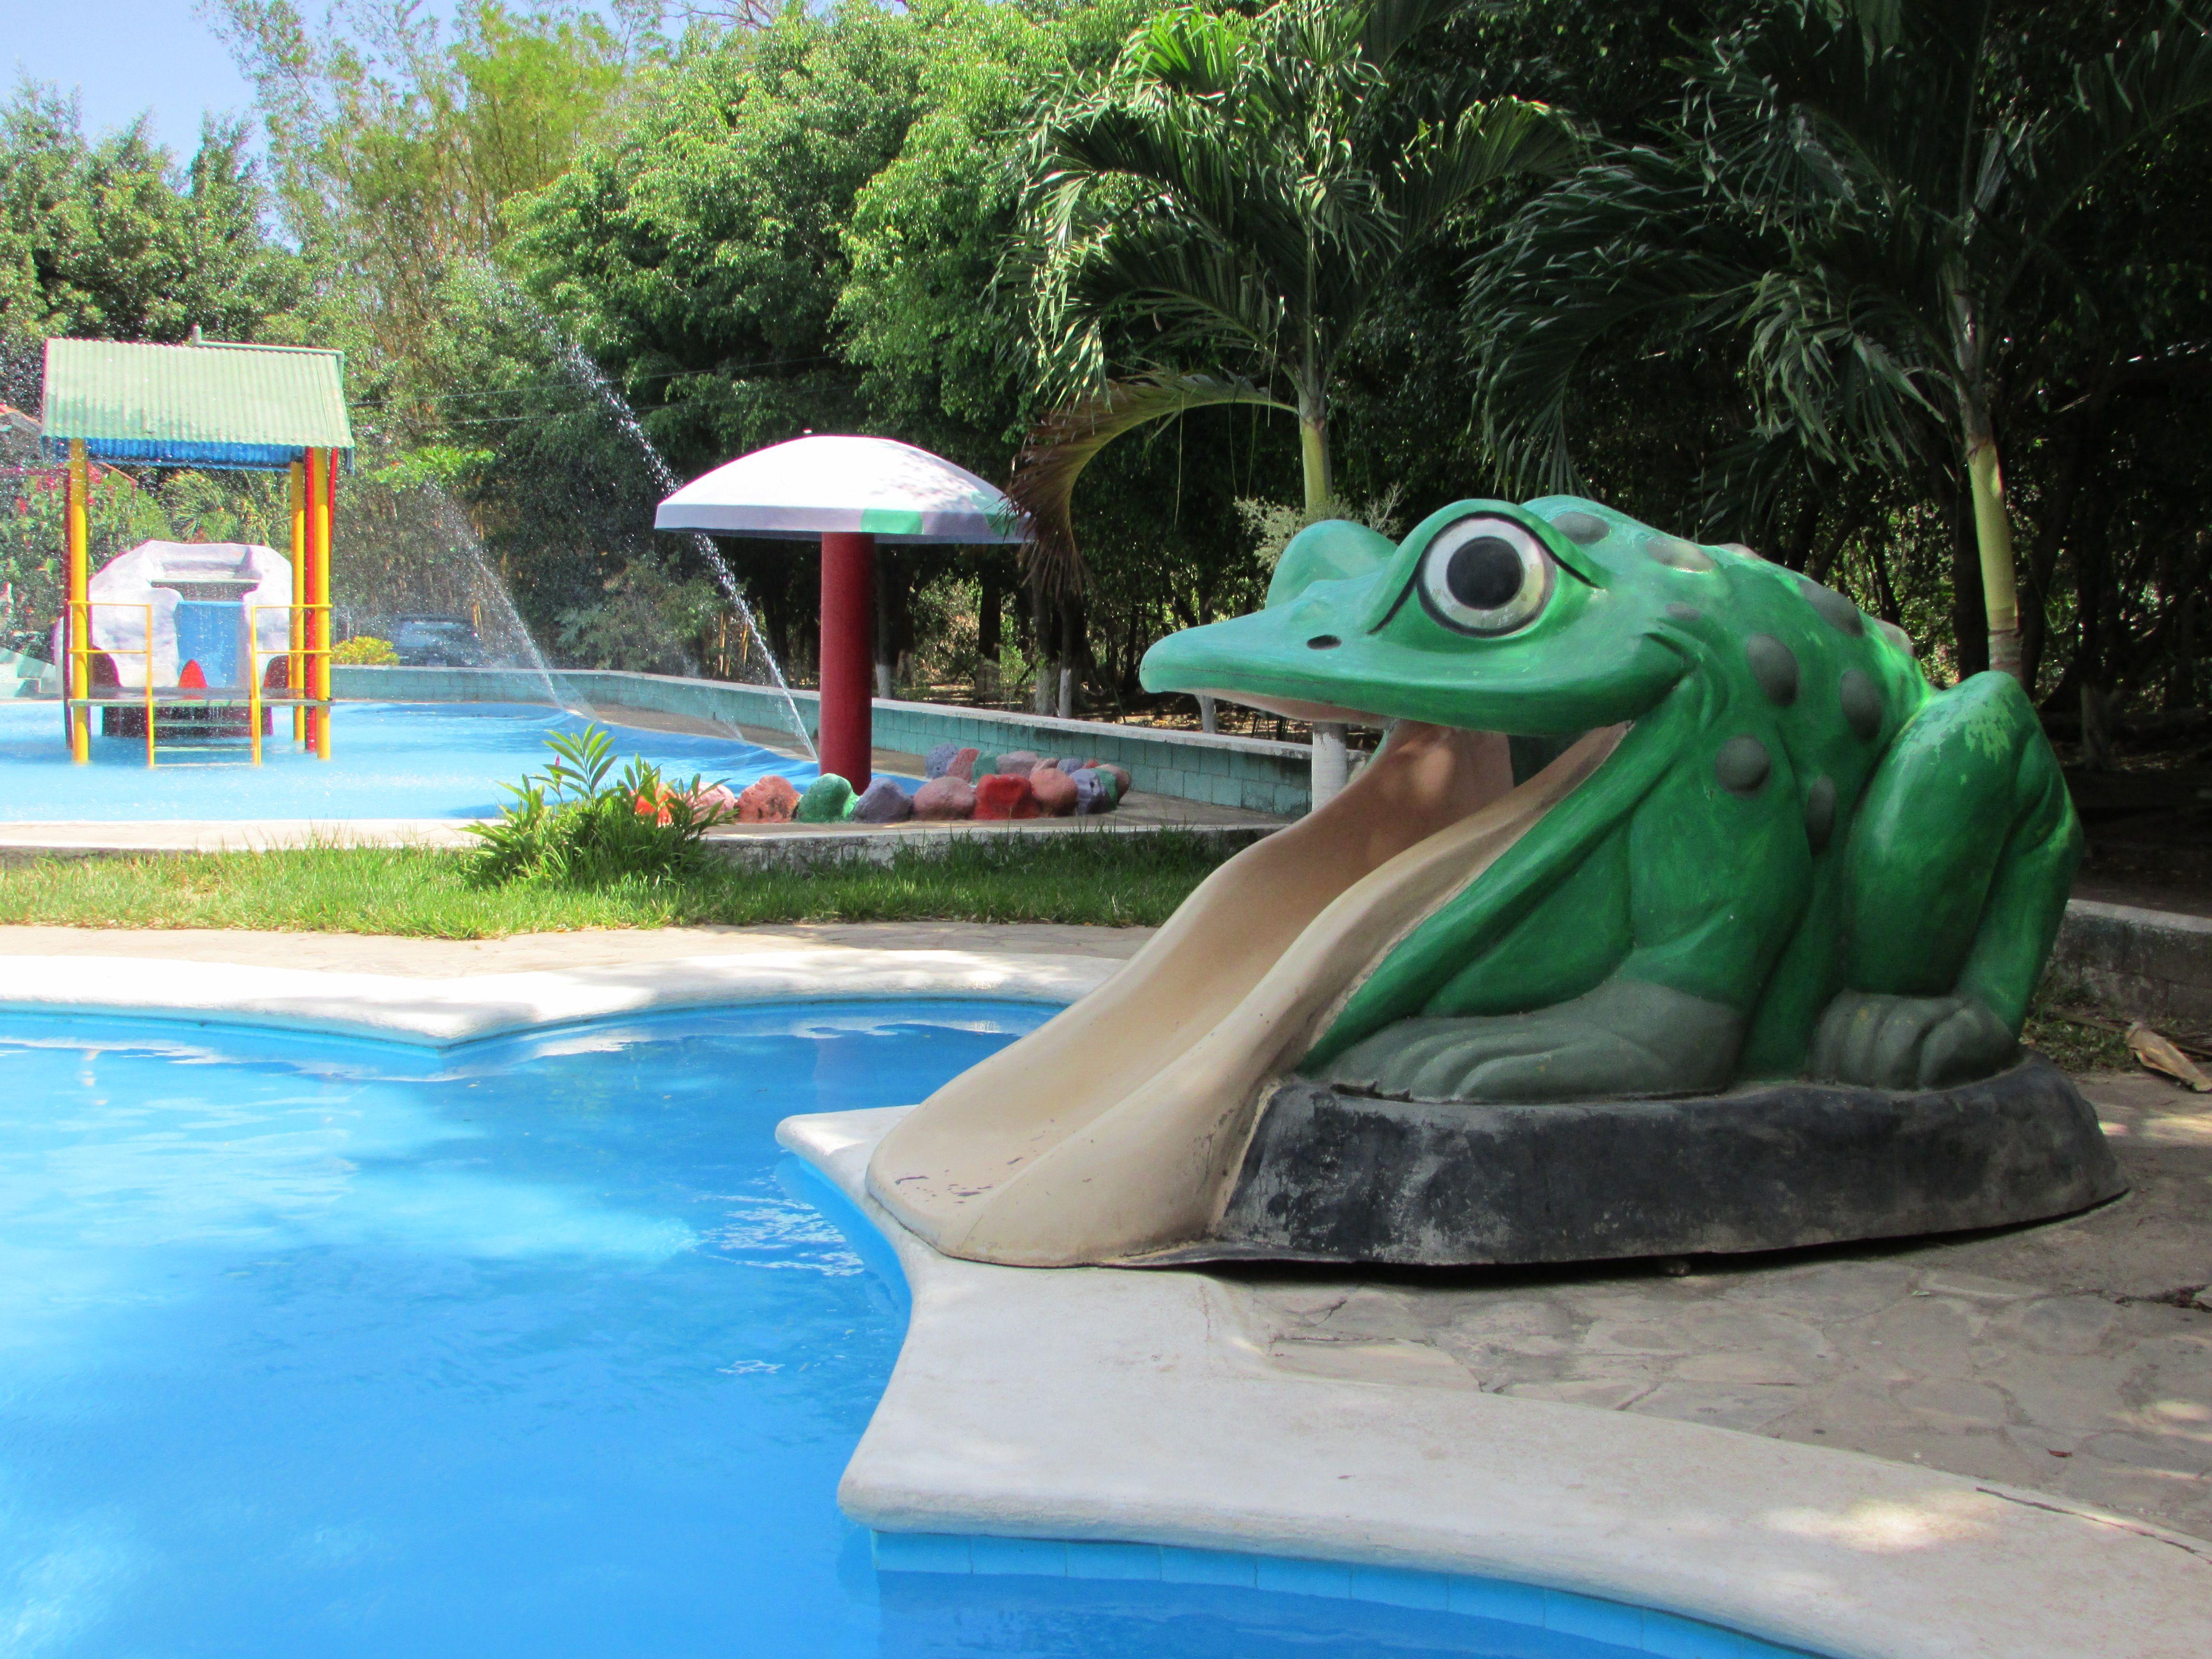 A Gigant Frog El Encanto Aqua Park Santiago De La Frontera El Salvador Photo By Ana Silva El Salvador Playground Pool Float